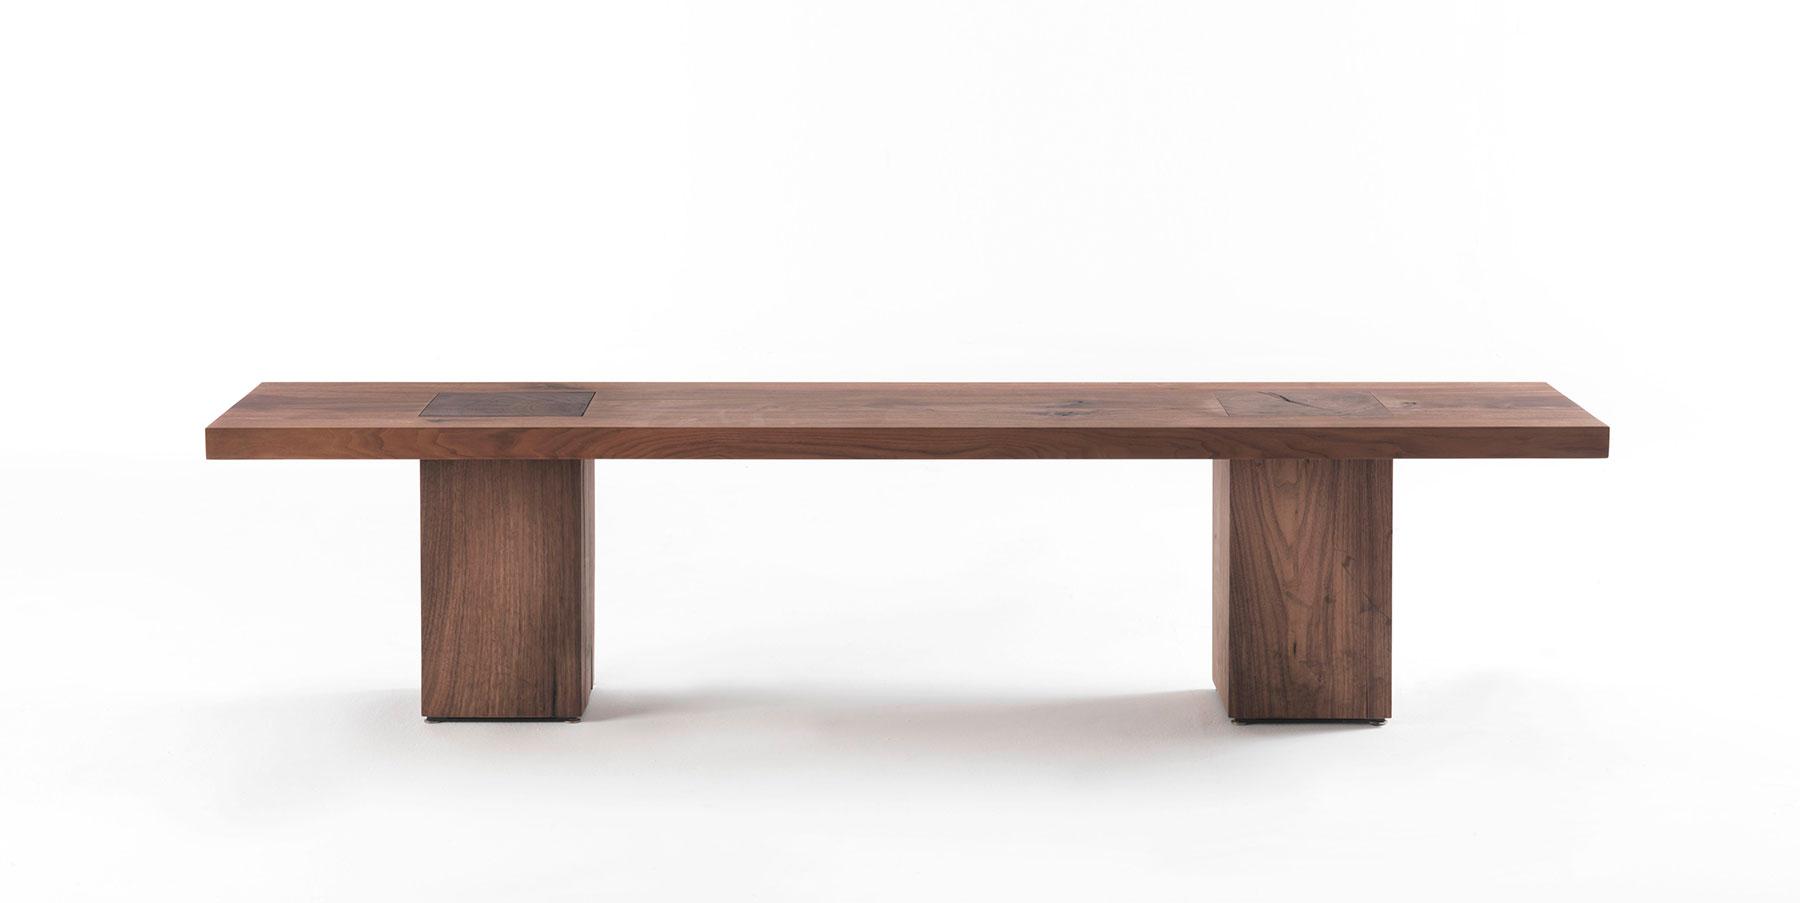 Designwebstore boss executive bench 240x45cm eiche - Boss eiche ...